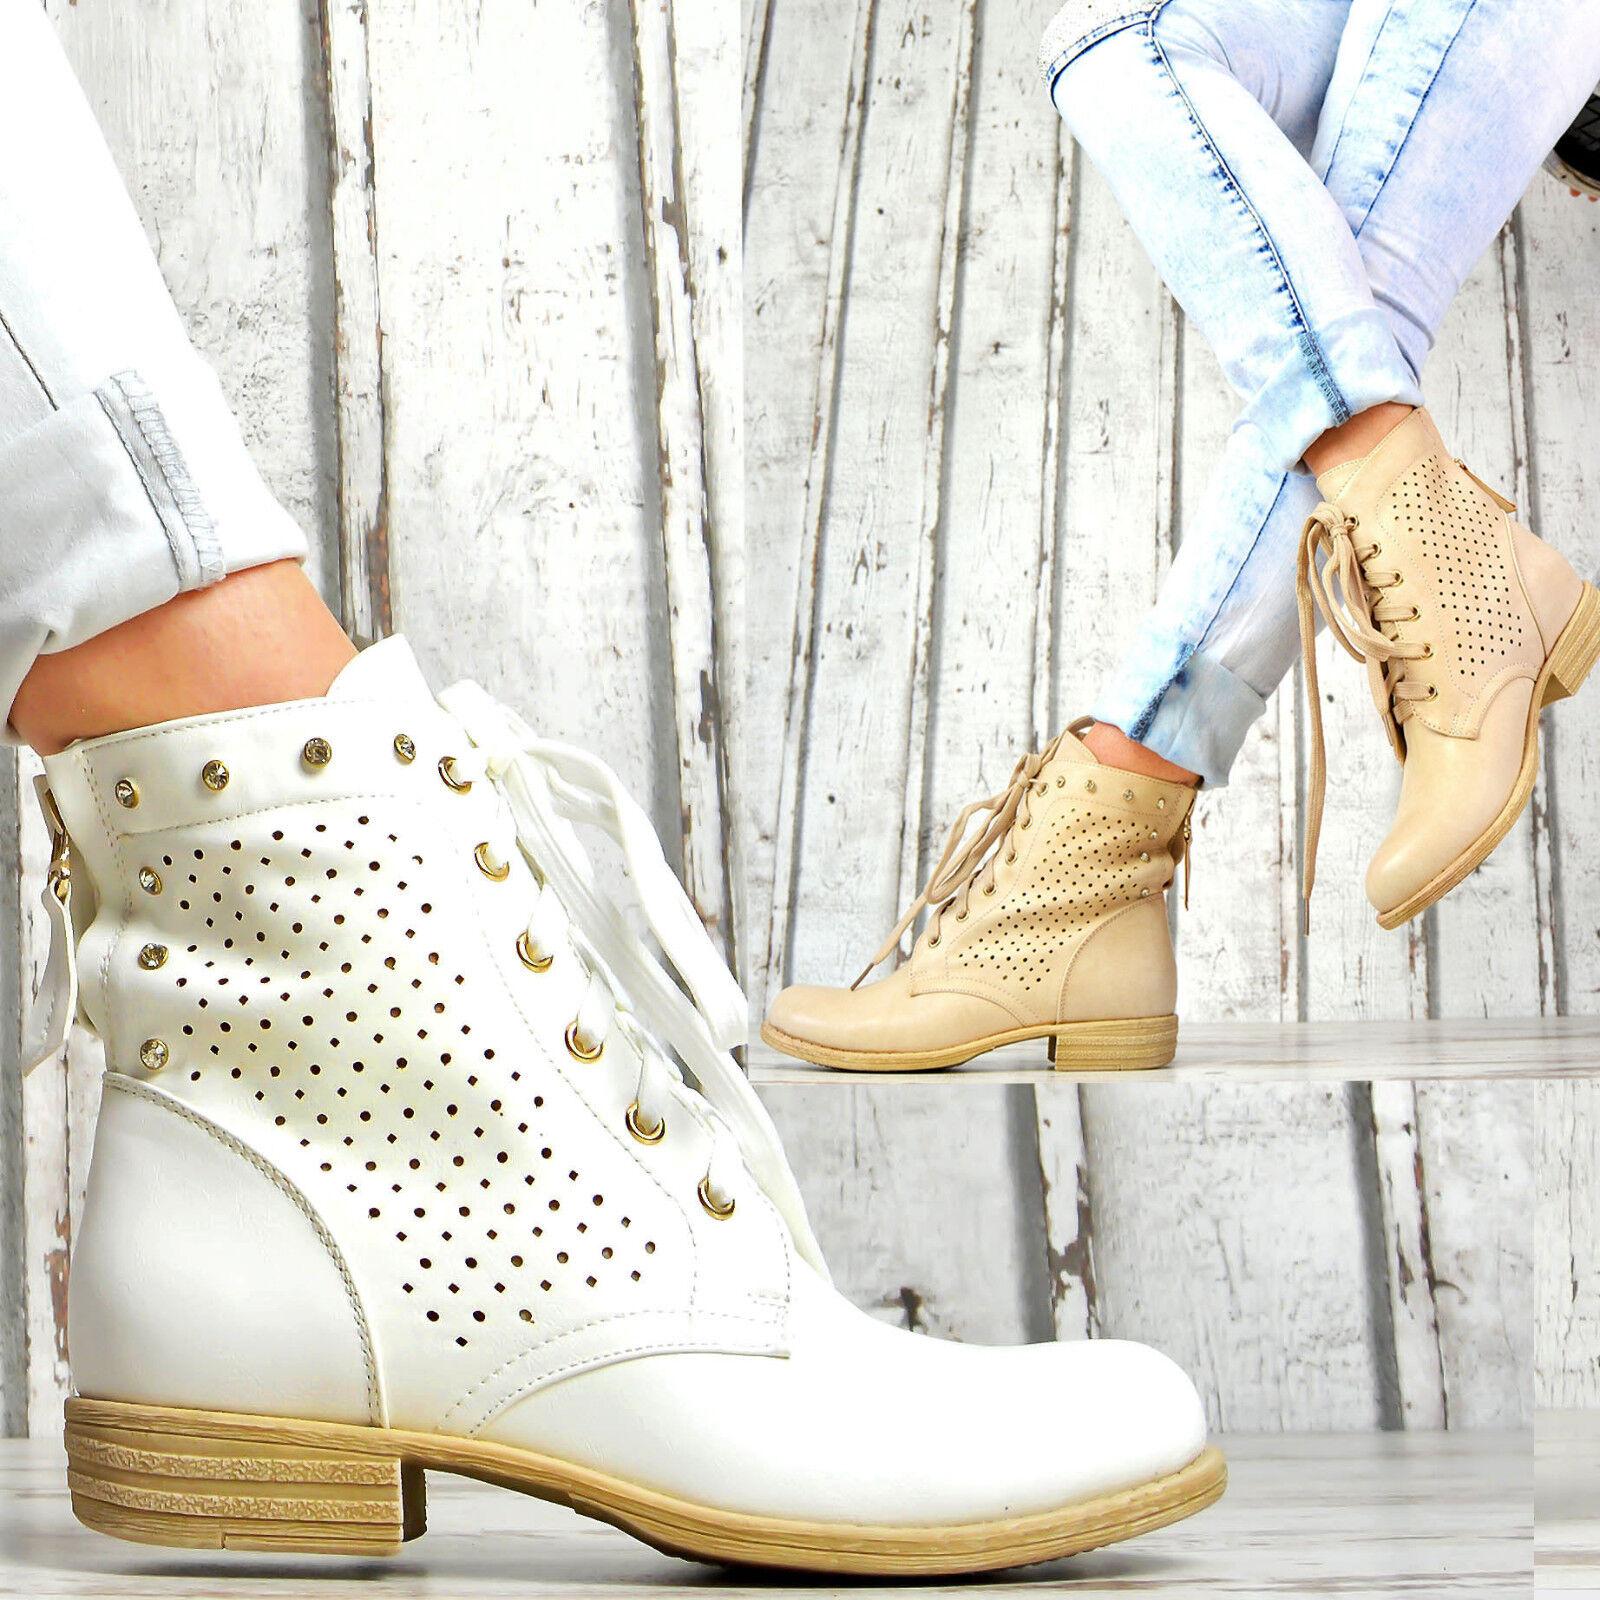 fbcc0d7c2e7a1a Neu Designer Damen Schuhe Biker Sommer Schnür Ankle Boots Stiefeletten Weiß